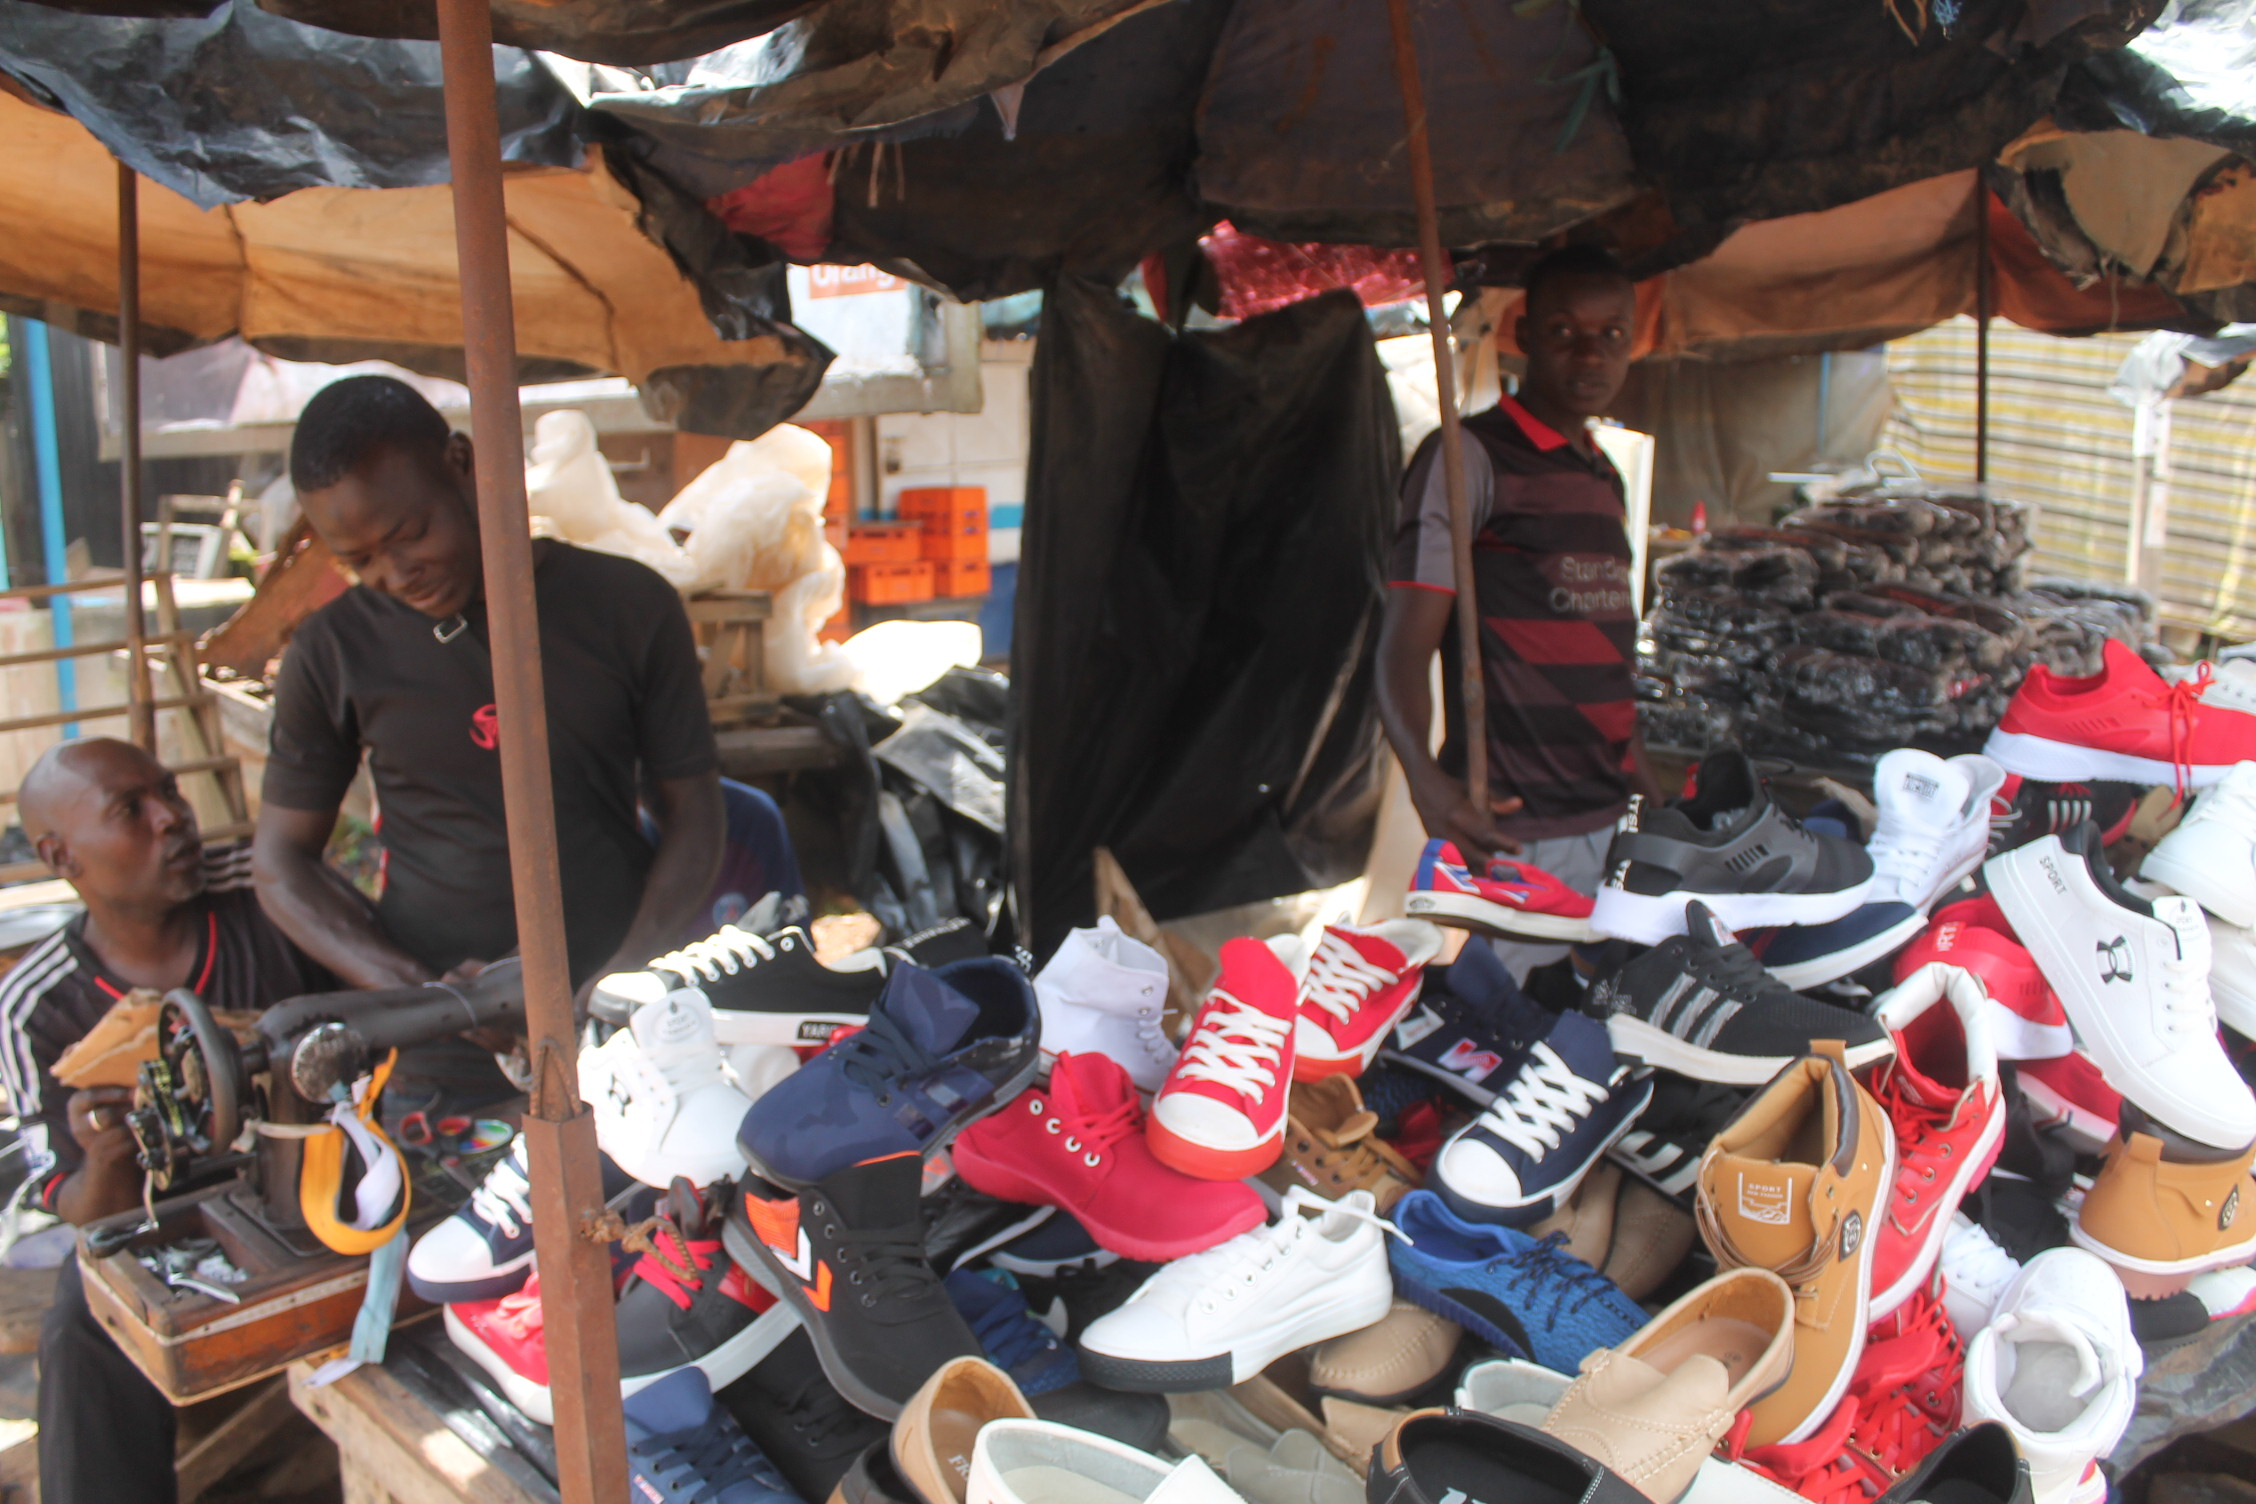 f0ebb28d6a1a10 File:Vendeur ambulant de chaussure 02.jpg - Wikimedia Commons